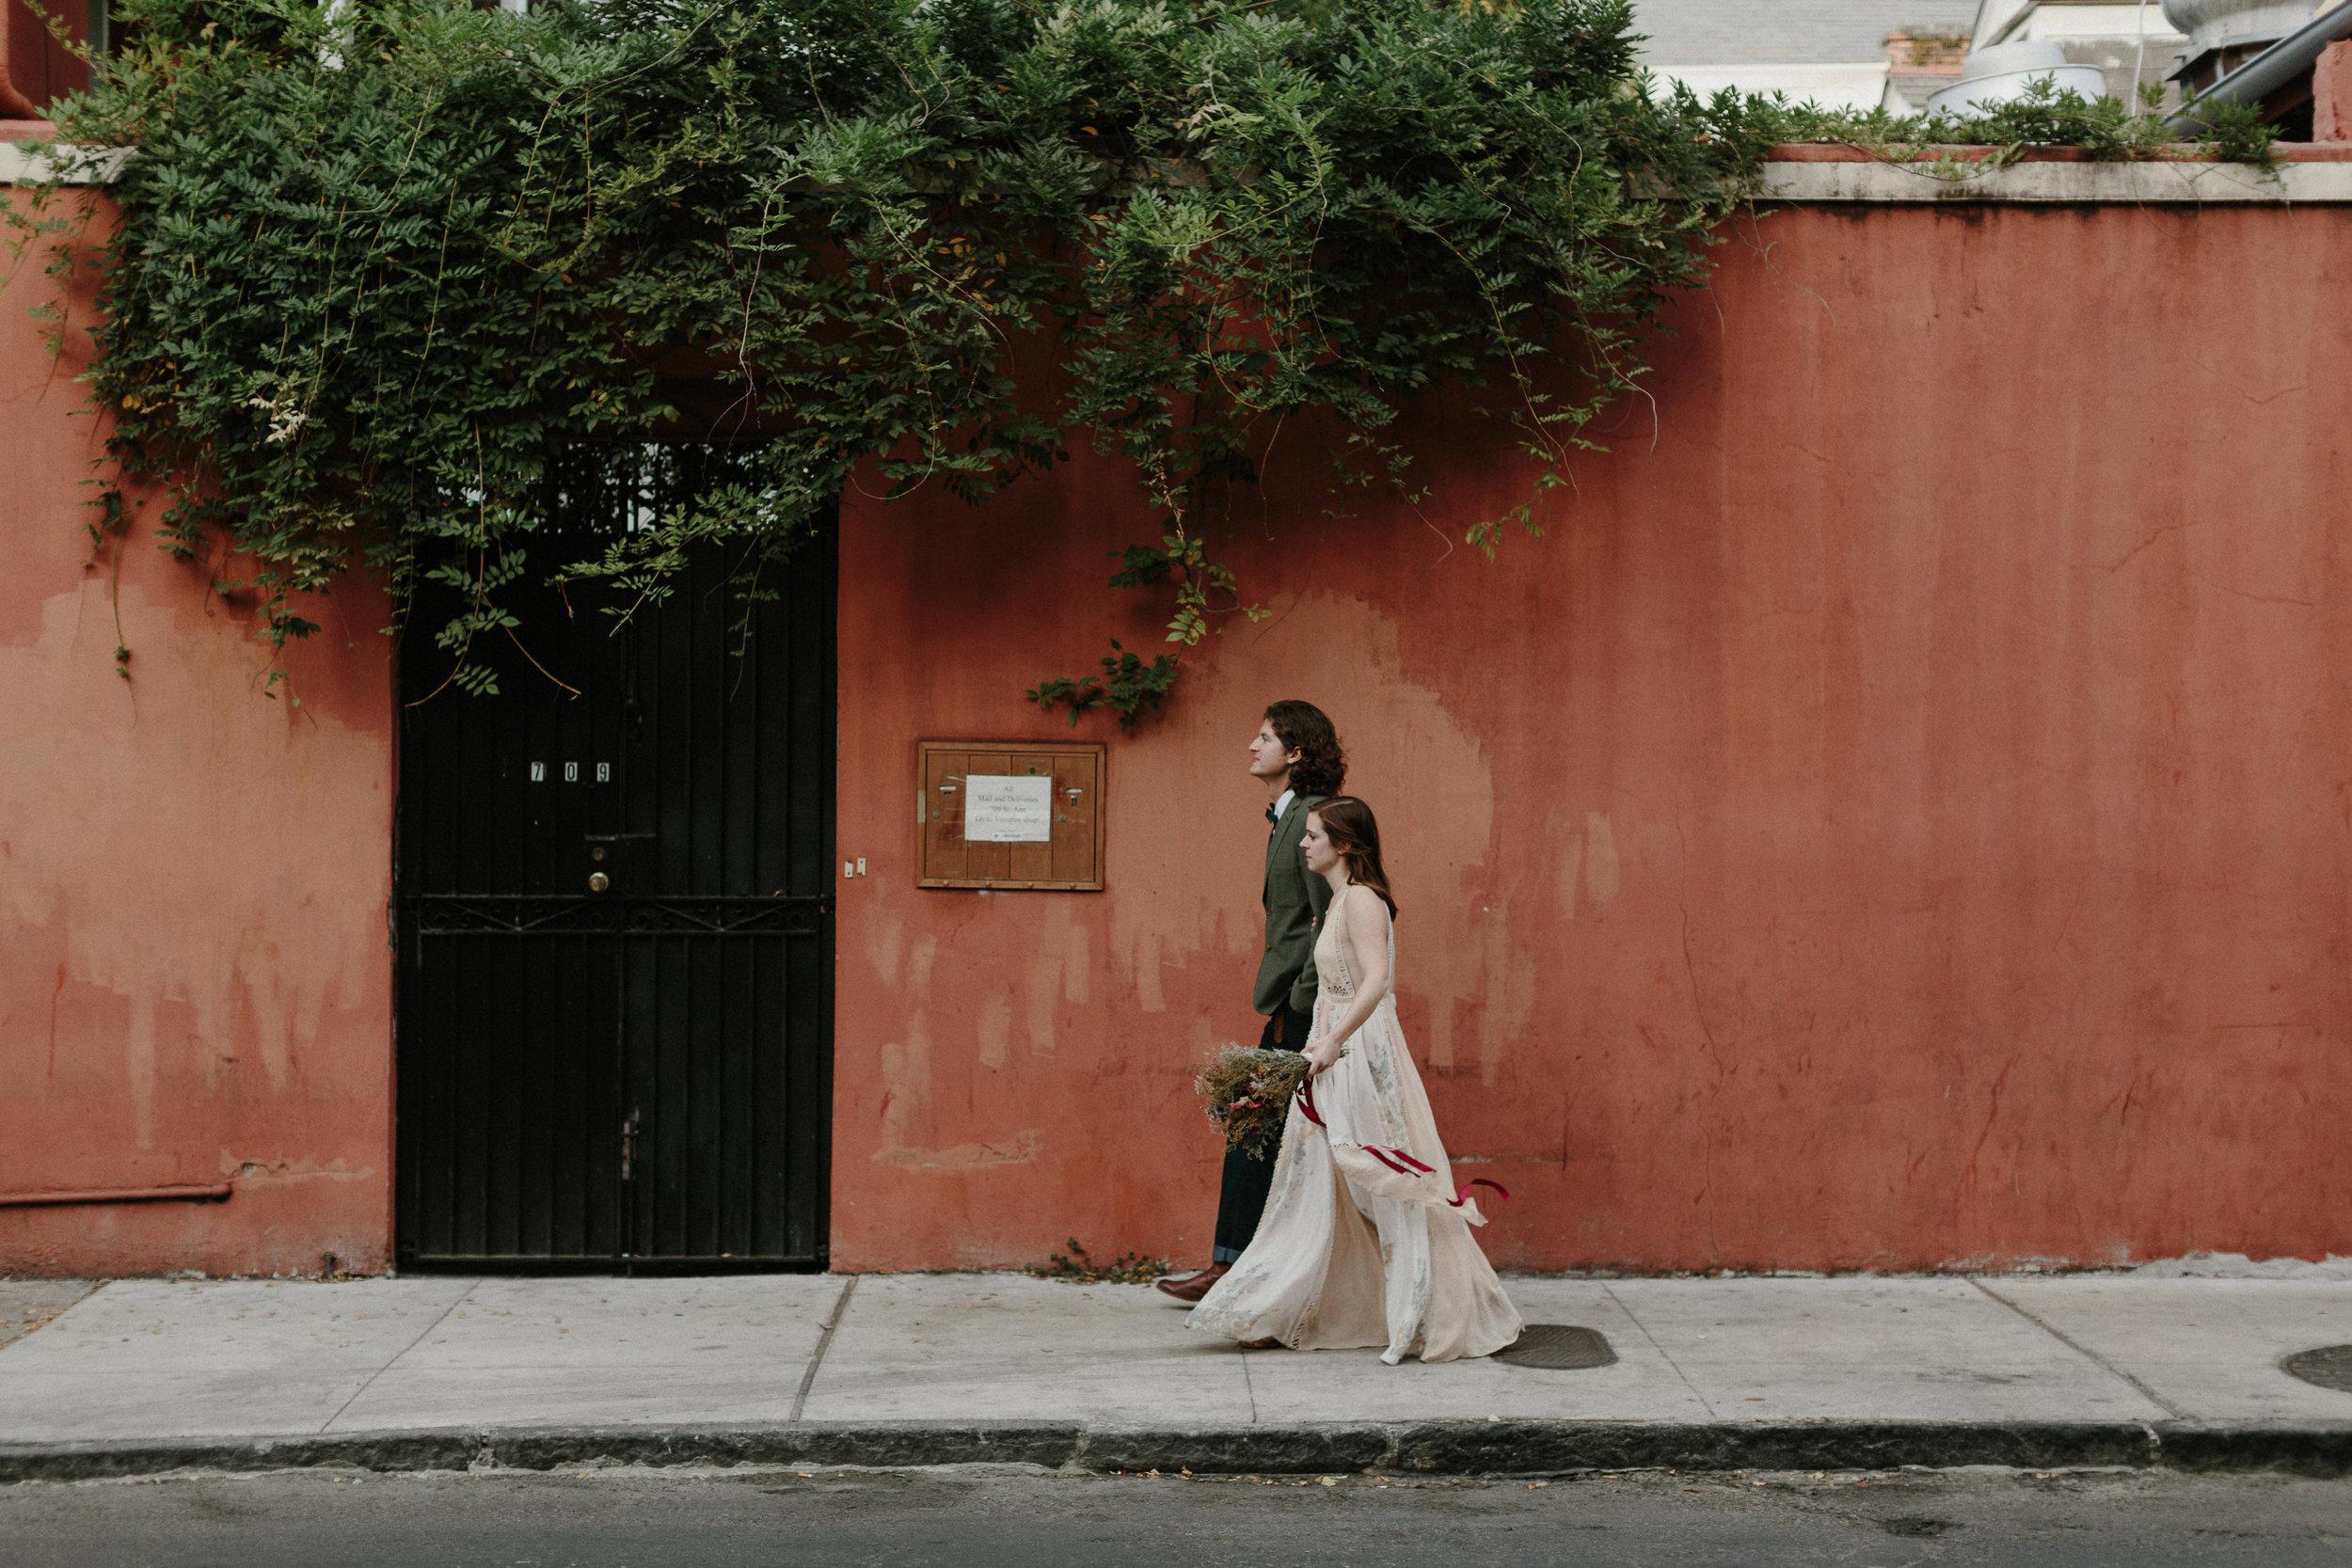 New-Orleans-Wedding-Photographer-2-2.jpg